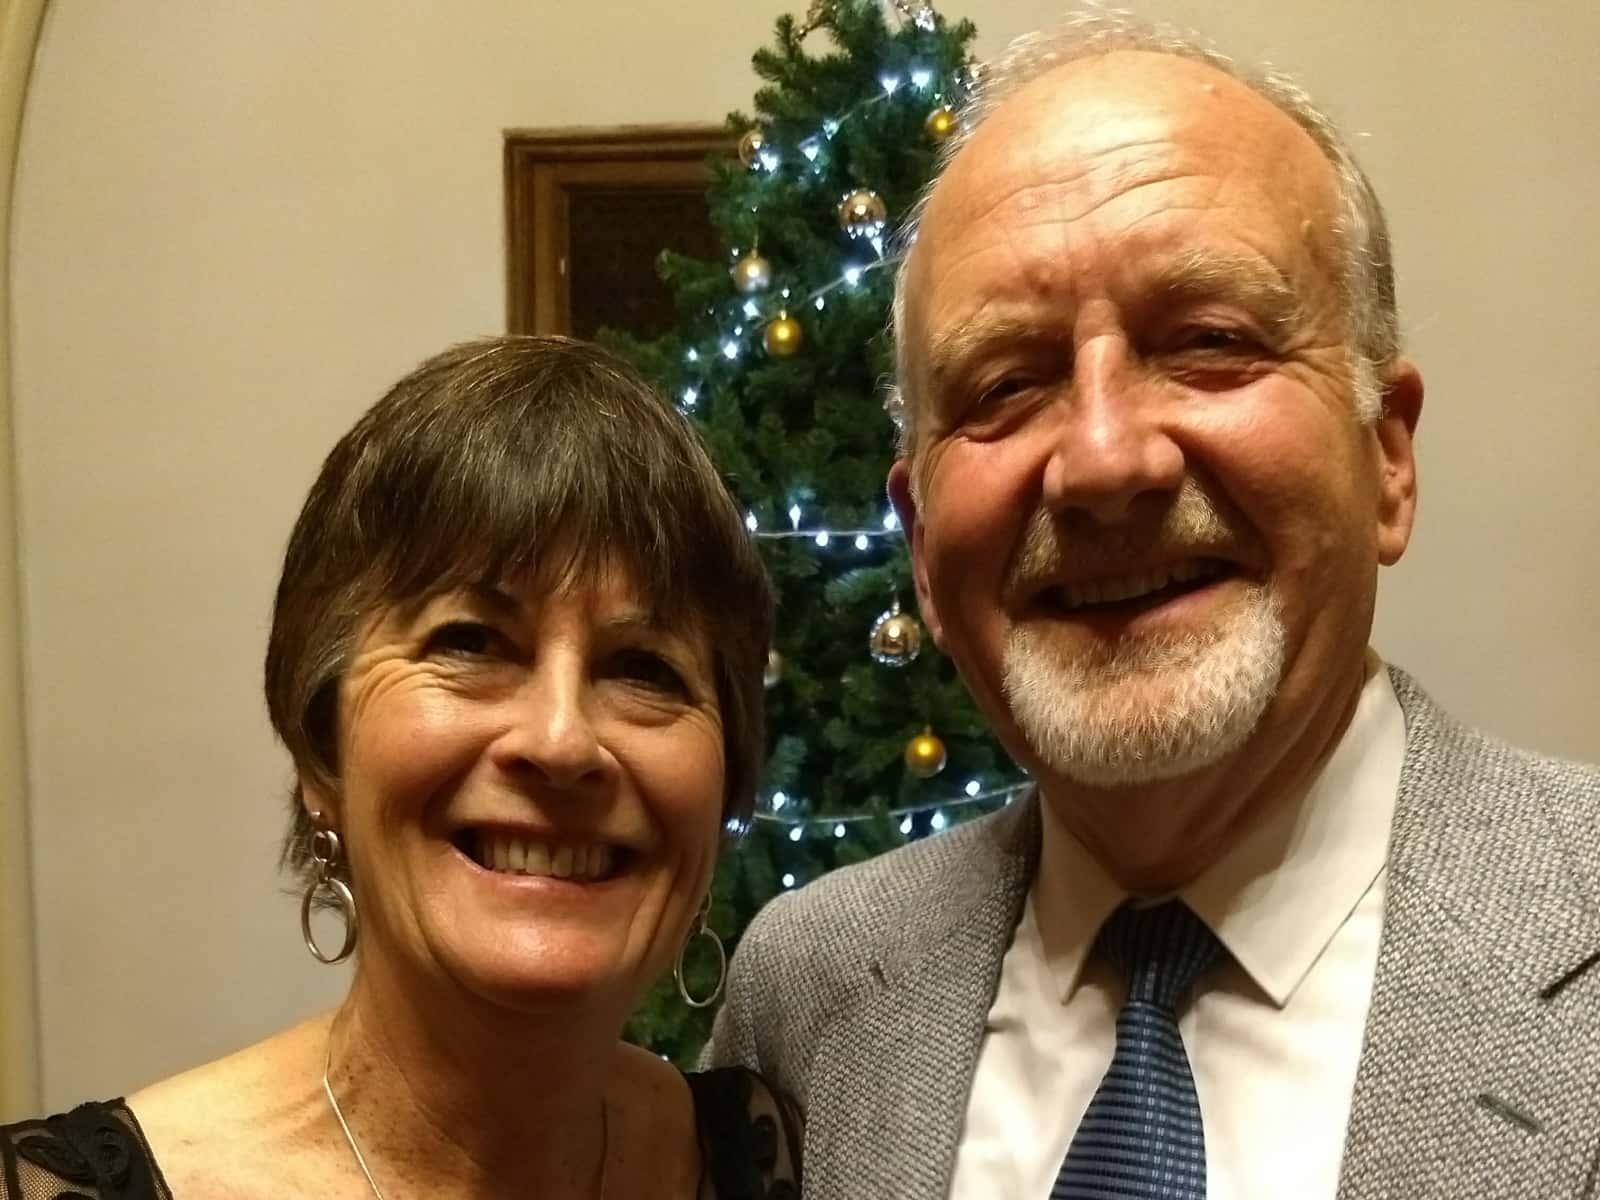 Christine & Stephen from London, United Kingdom